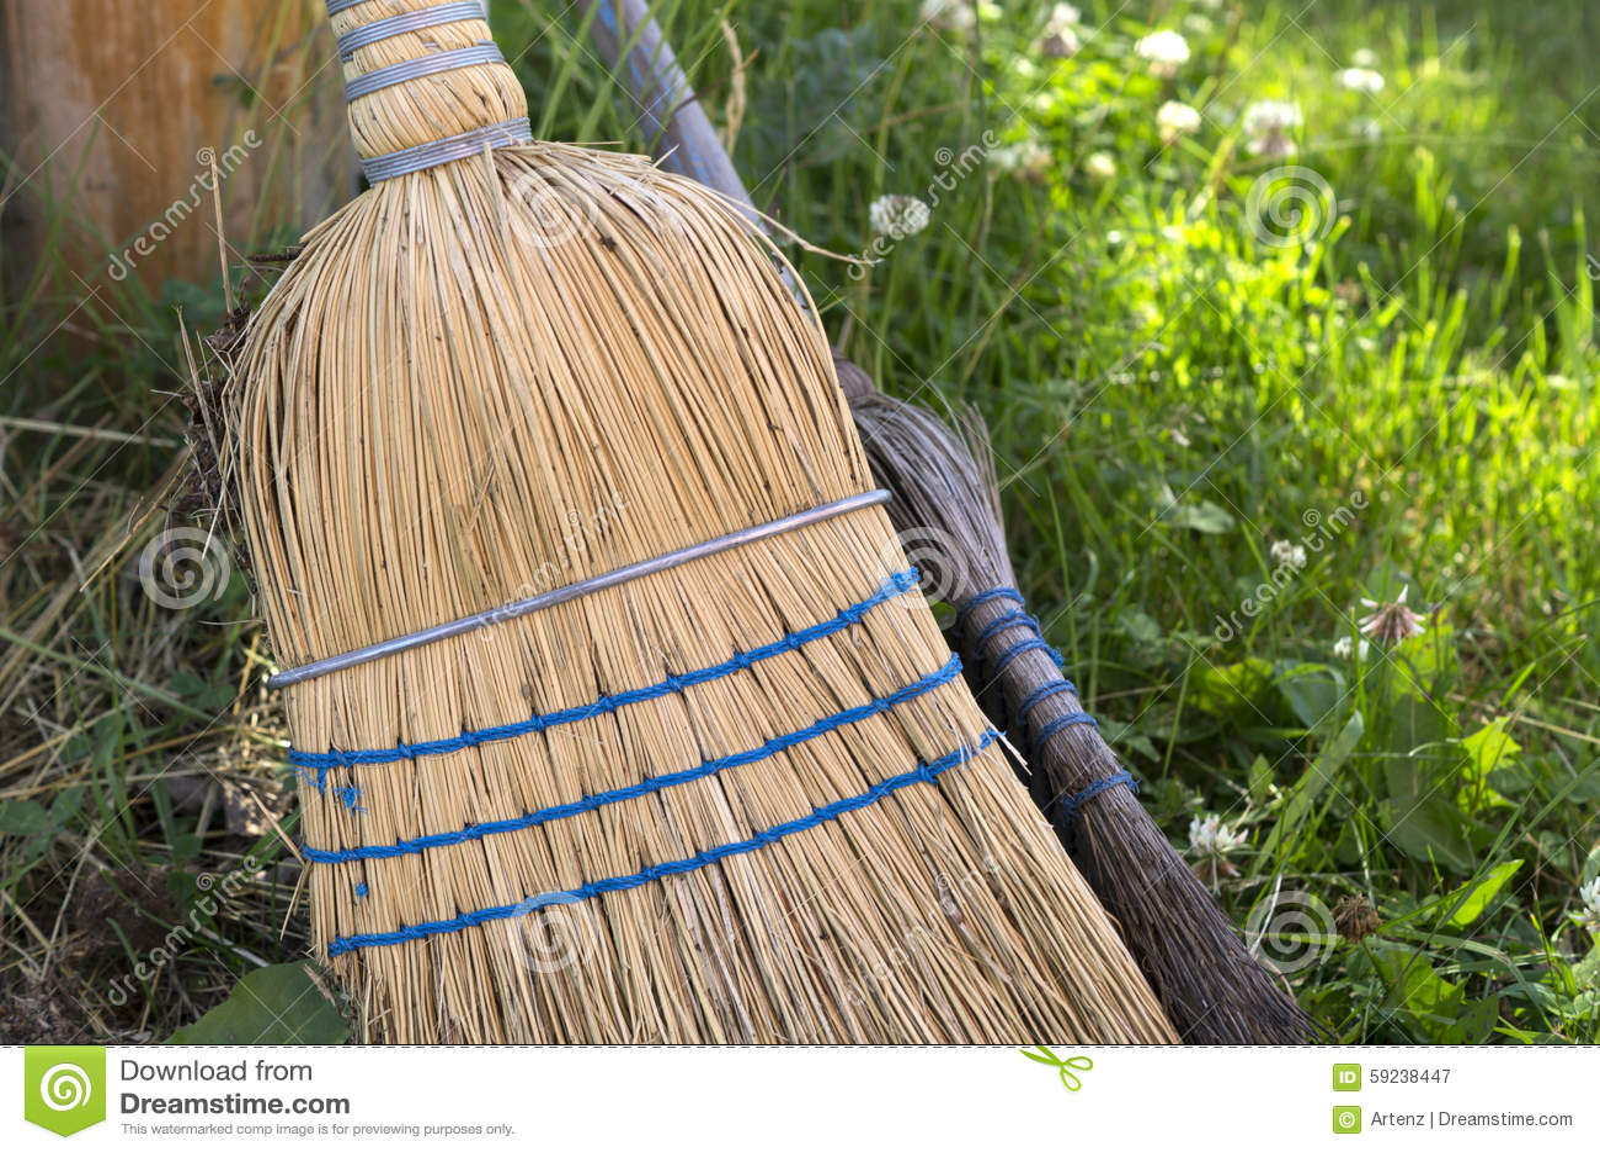 Download Straw Brooms imagen de archivo. Imagen de cerda, retro - 59238447